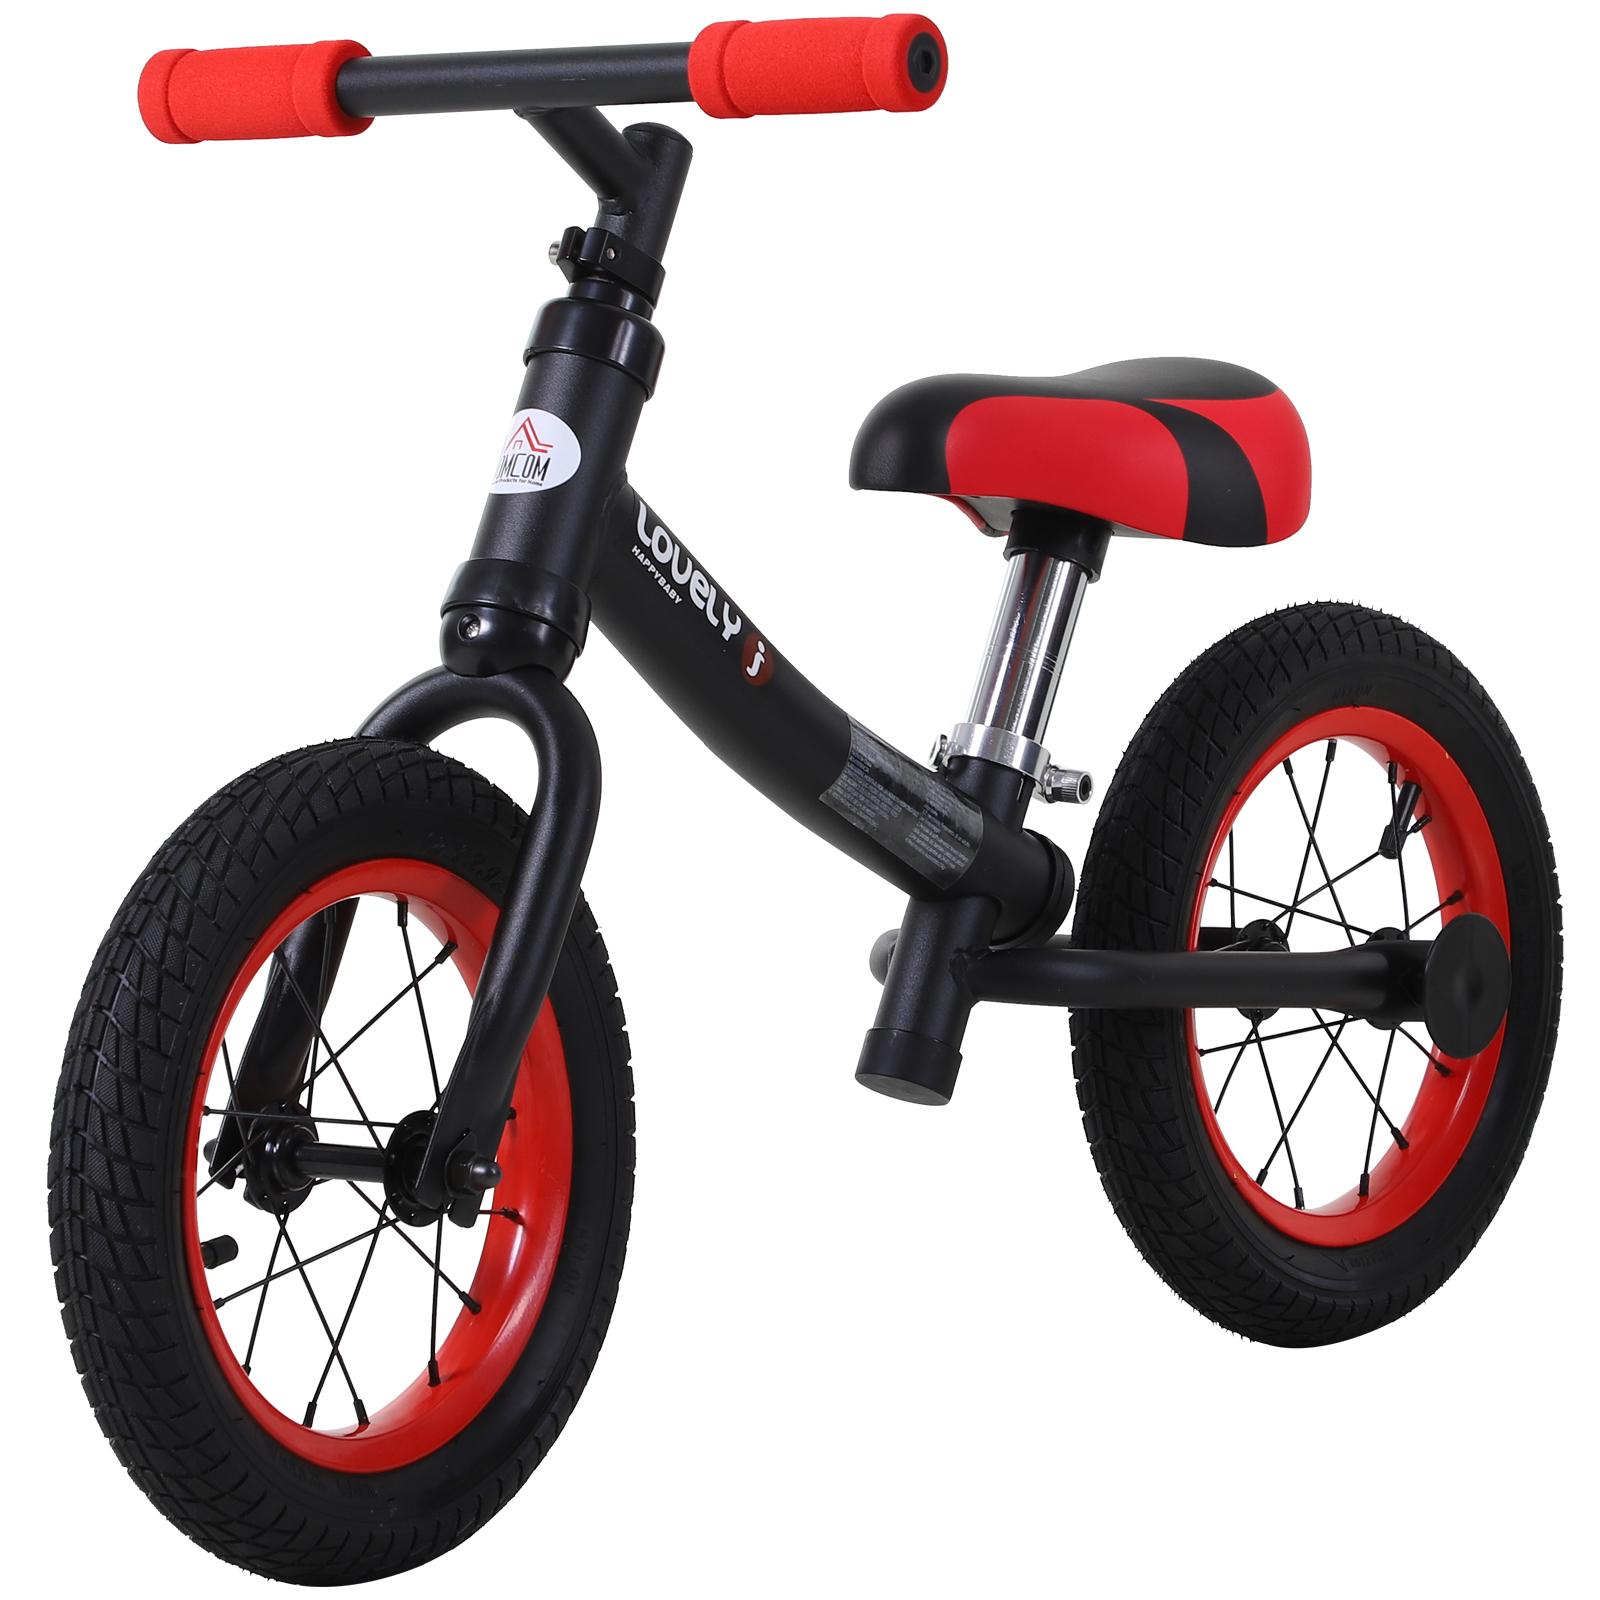 Bicicleta-sin-Pedales-de-Altura-de-Asiento-Regulable-31-45cm-2-5-Anos miniatura 4